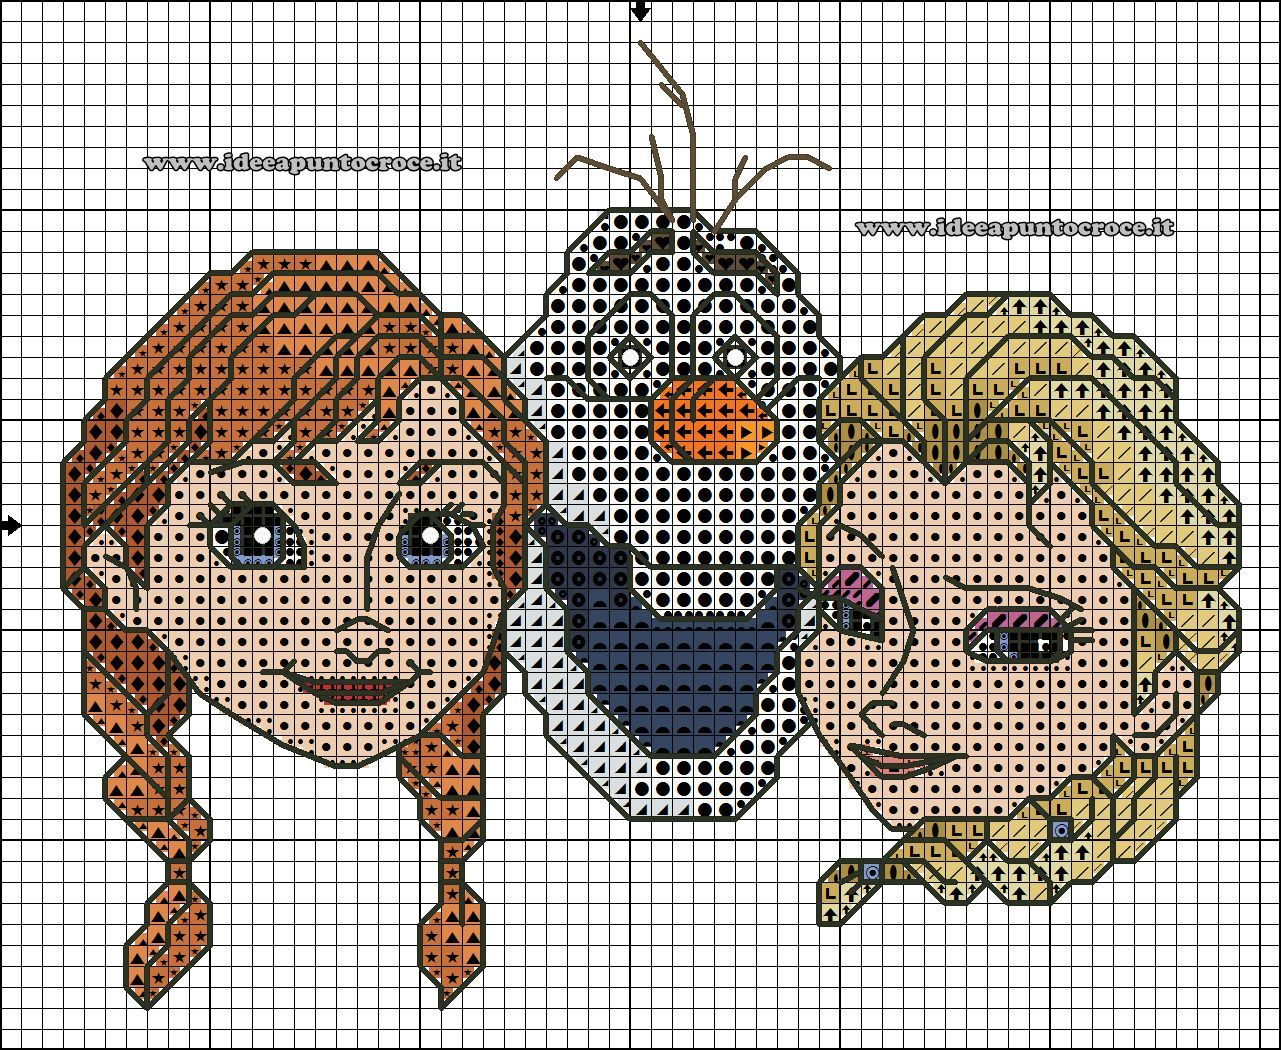 schema elsa e anna frozen | Disney cross stitch | Pinterest ...